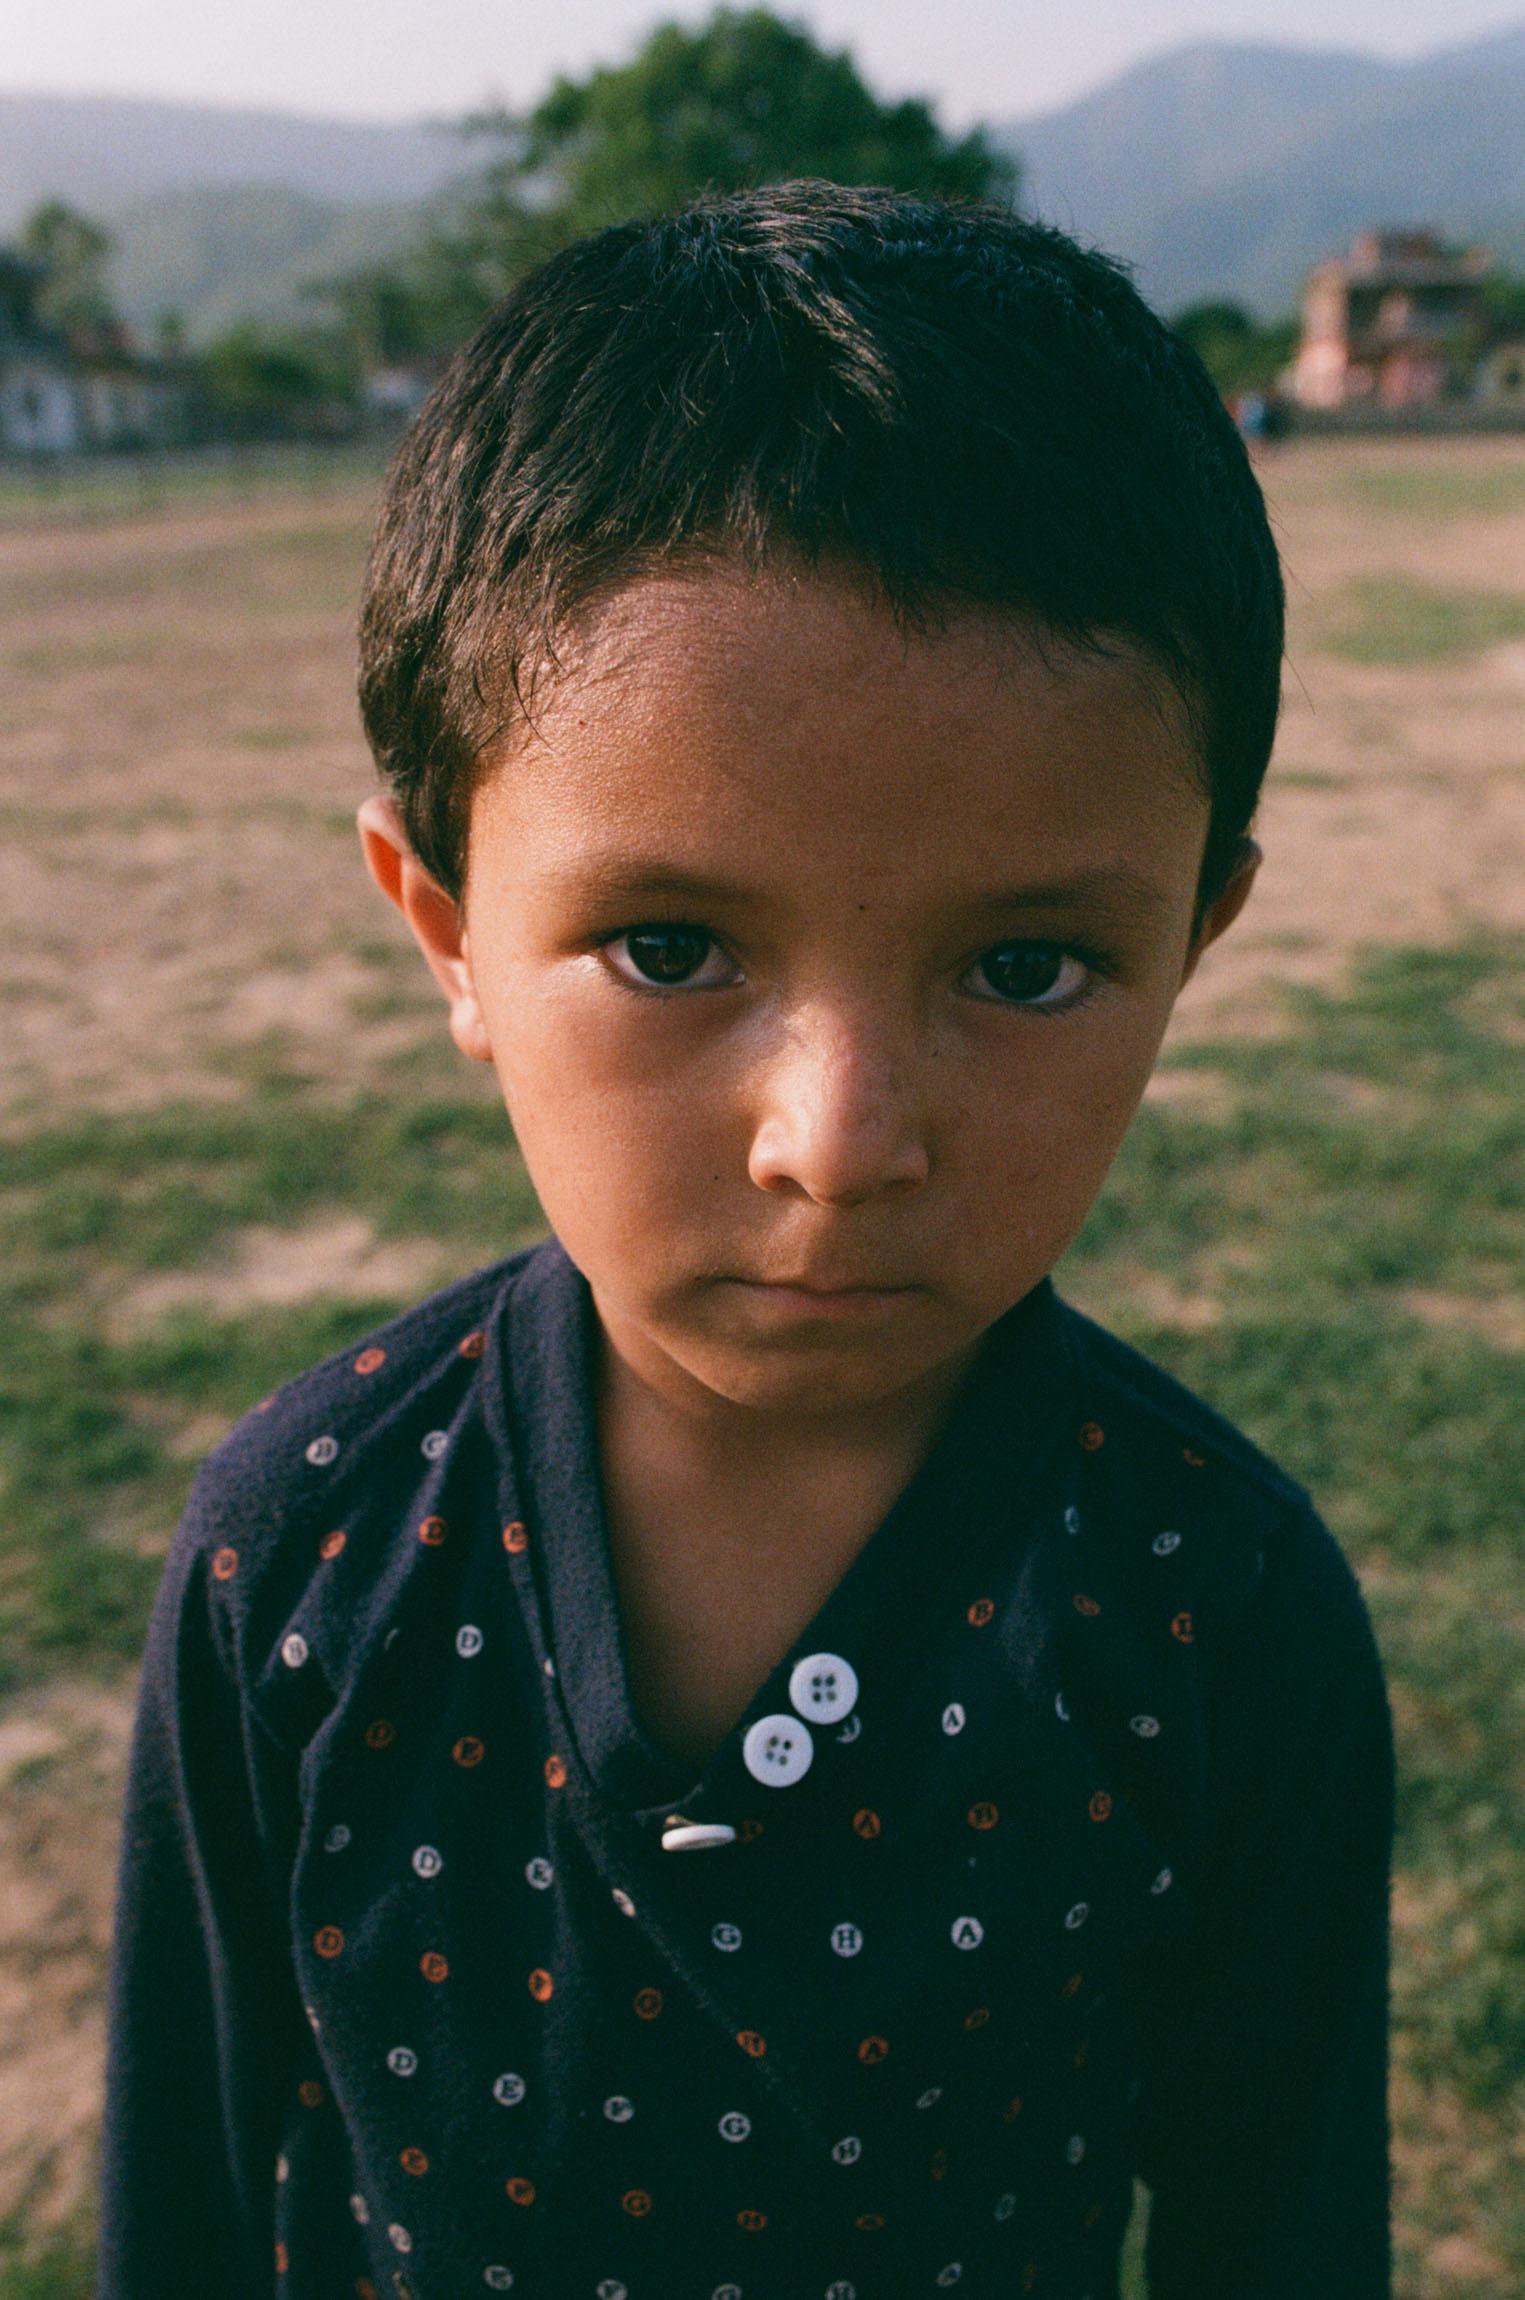 21392_JRE_Nepal_008-16site.jpg